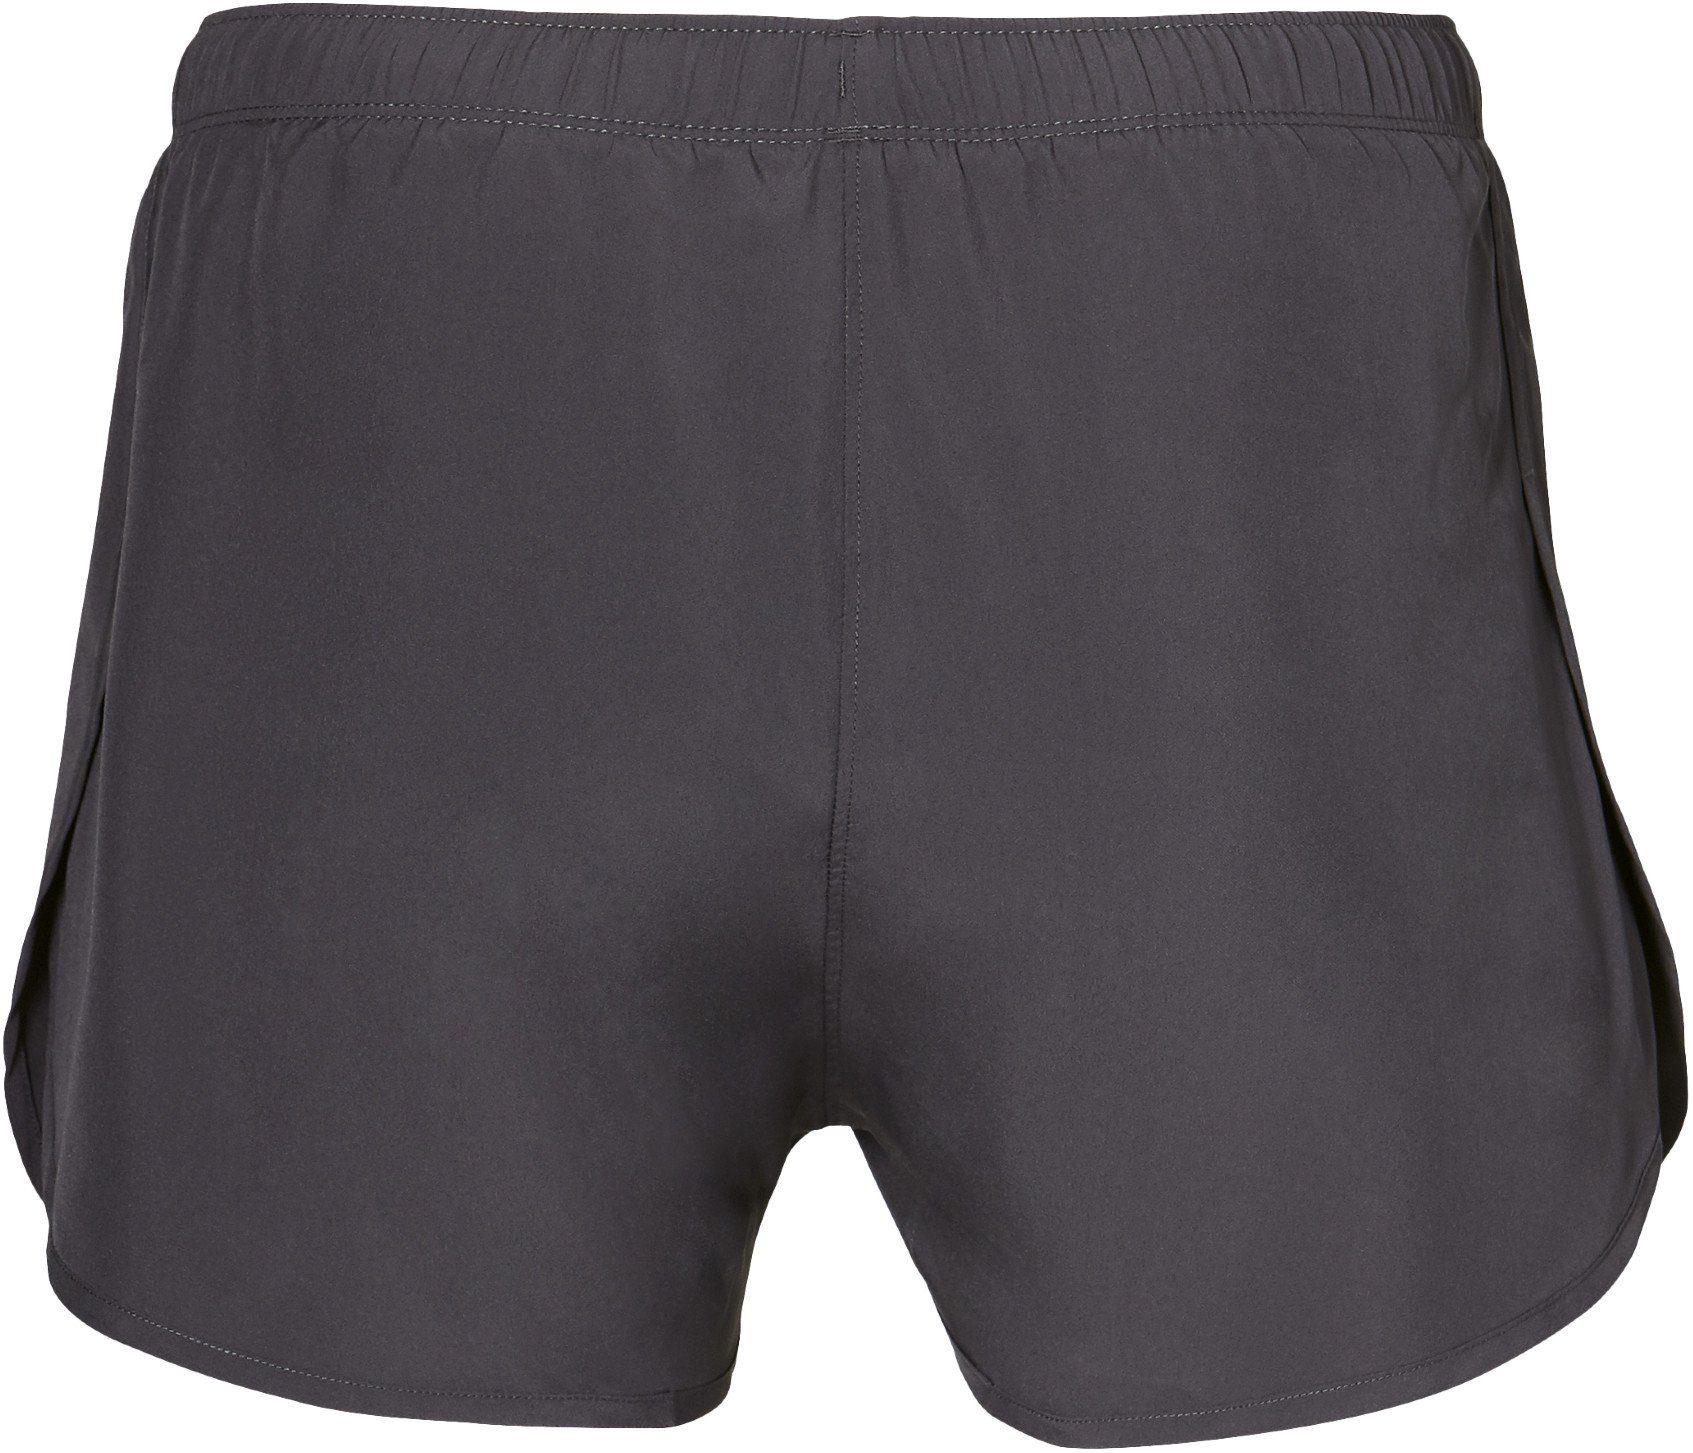 Herren Asics Hose »Silver Split Shorts Herren« grau | 04550214364116